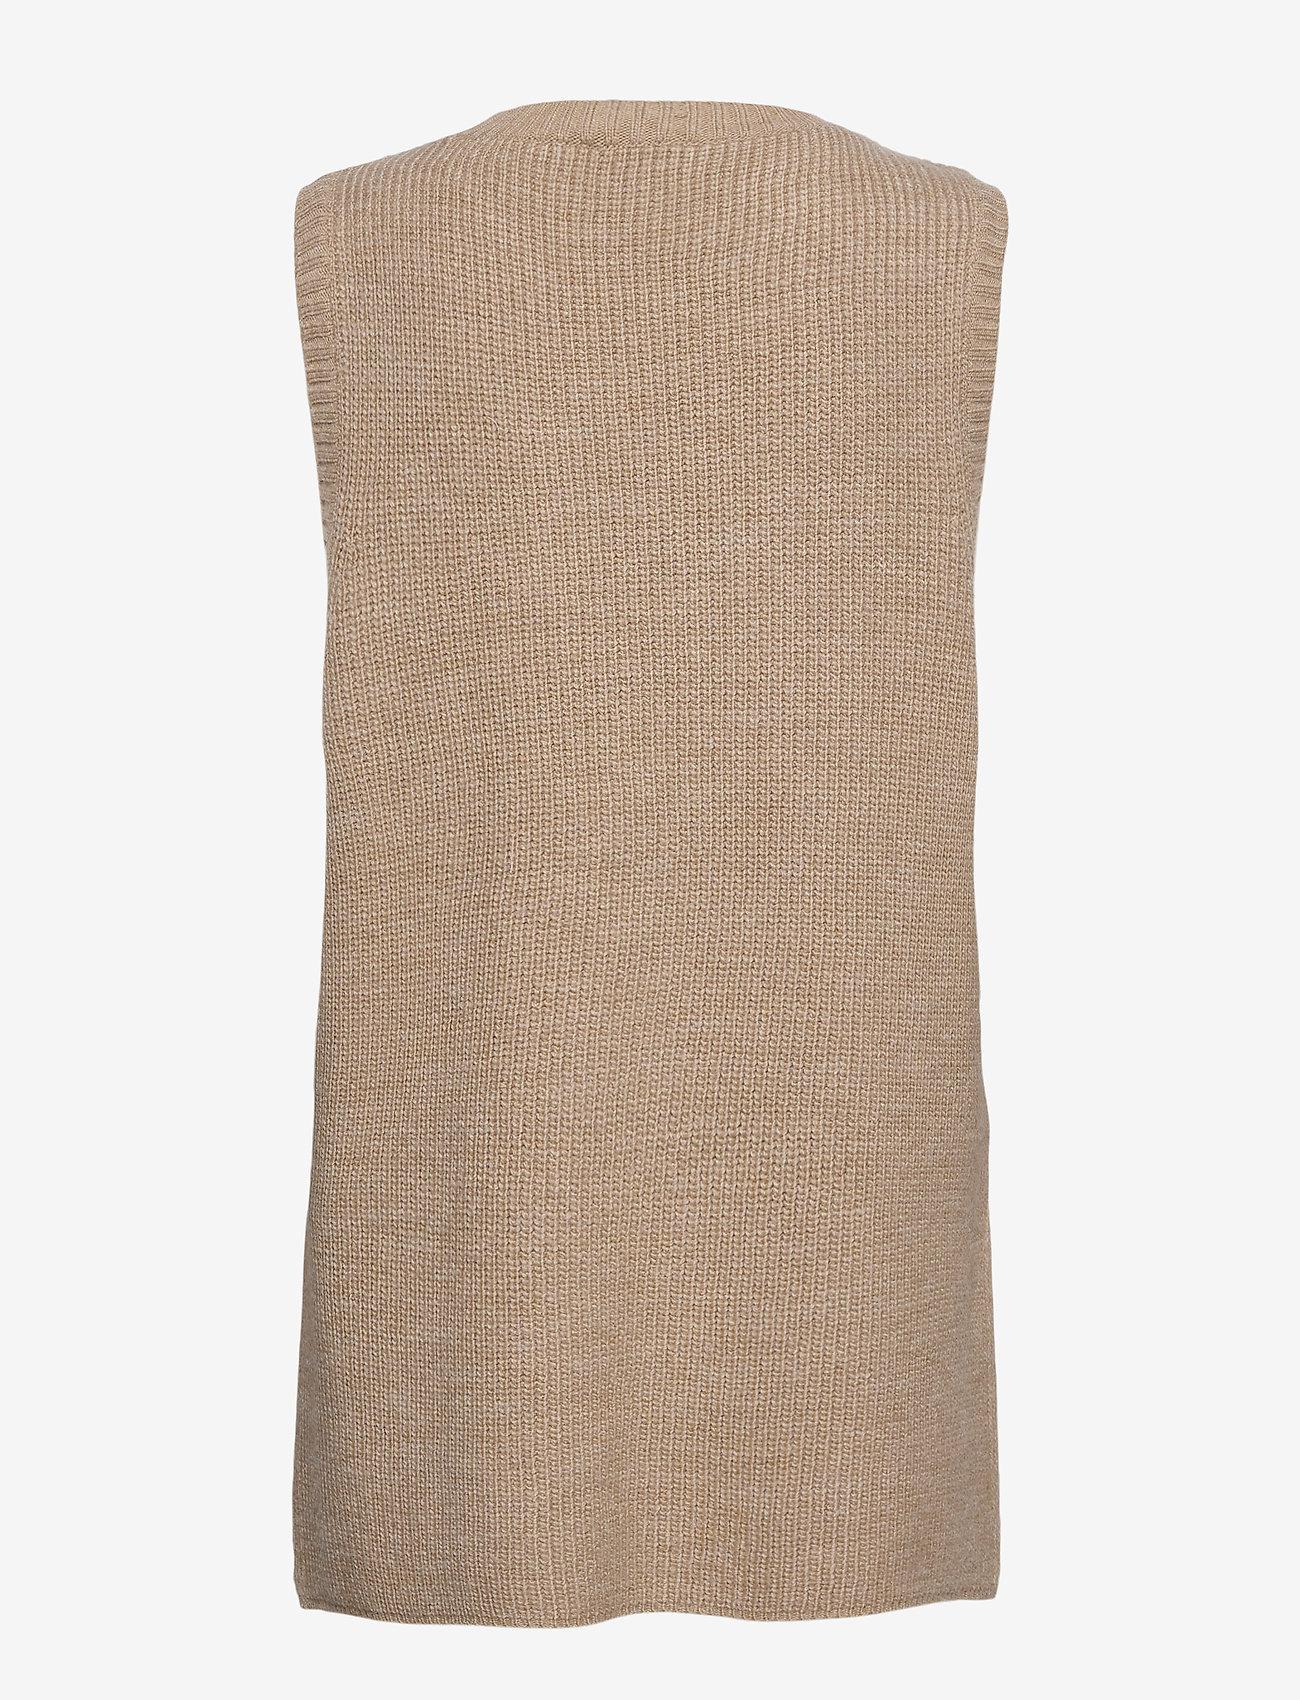 Modström - Trey vest - knitted vests - powder sand - 1